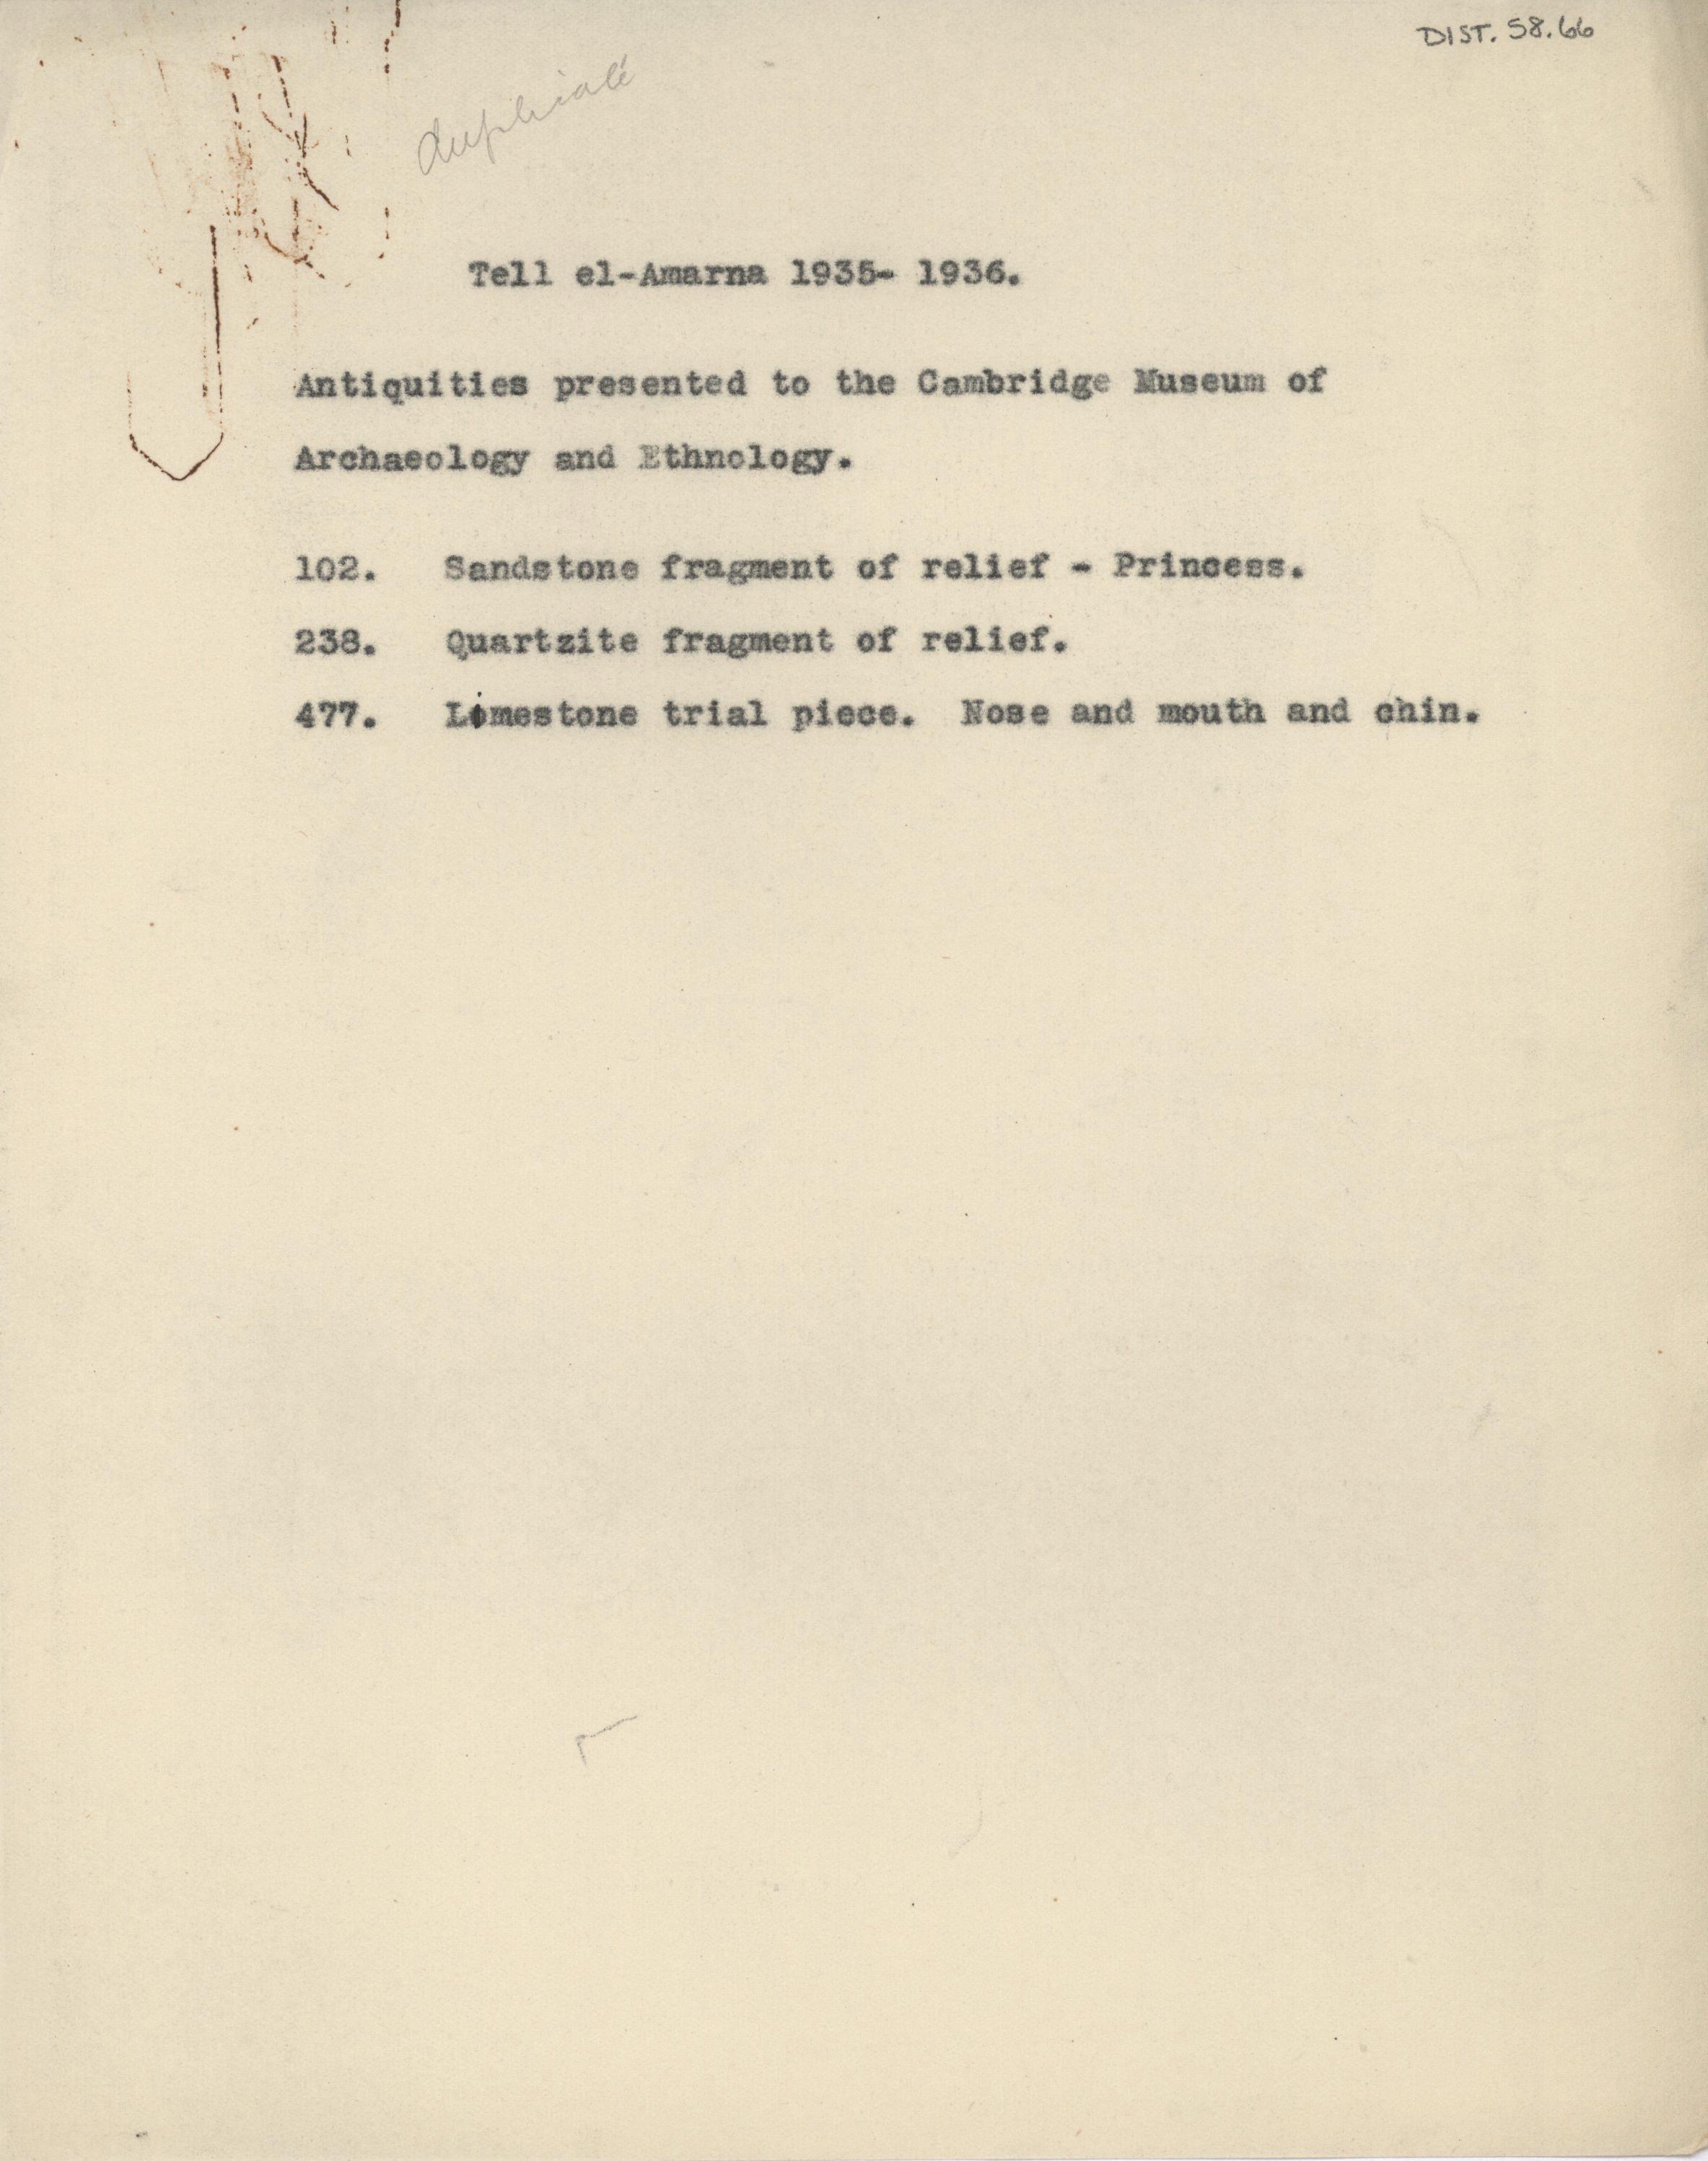 1934-35 el-Amarna DIST.58.66